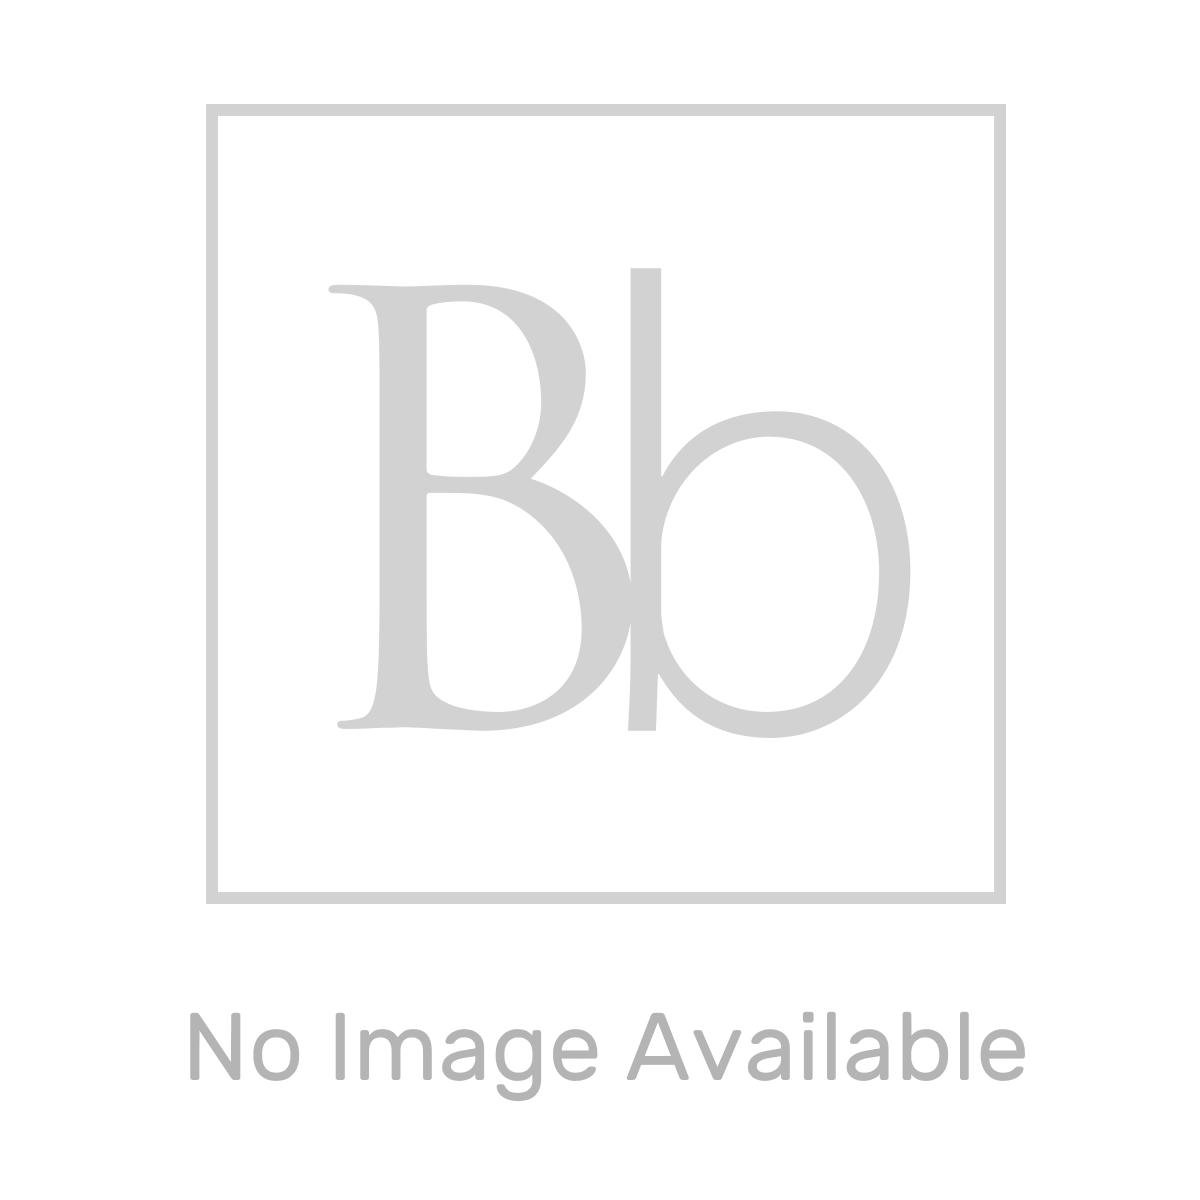 Aquadart Black Slate Shower Tray 1100 x 900 Lifestyle